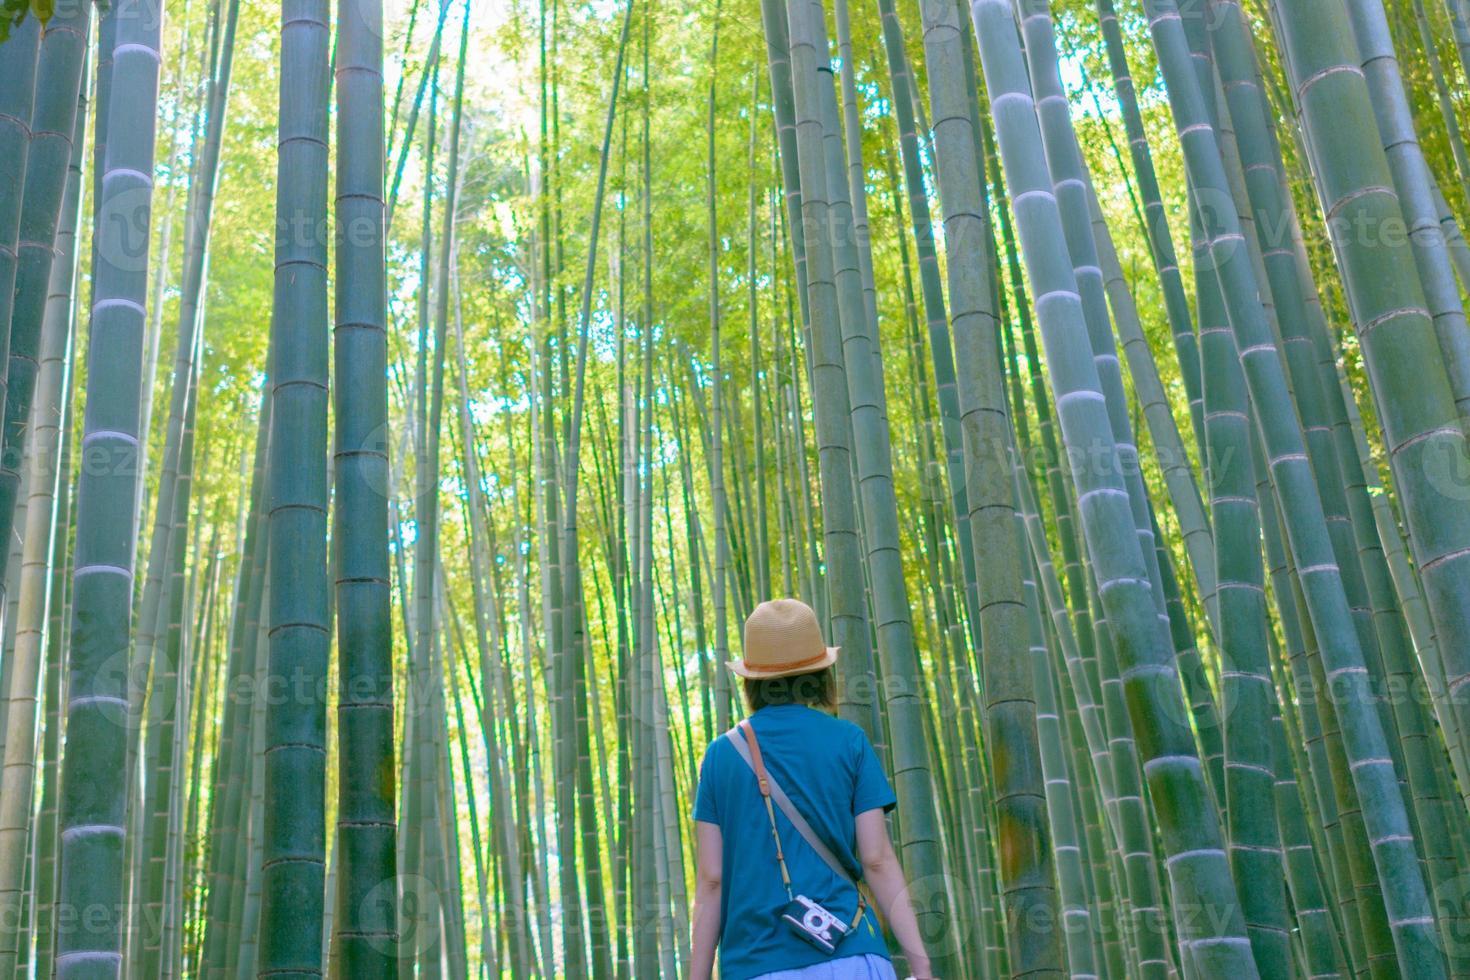 joven explora en los bosques de bambú foto